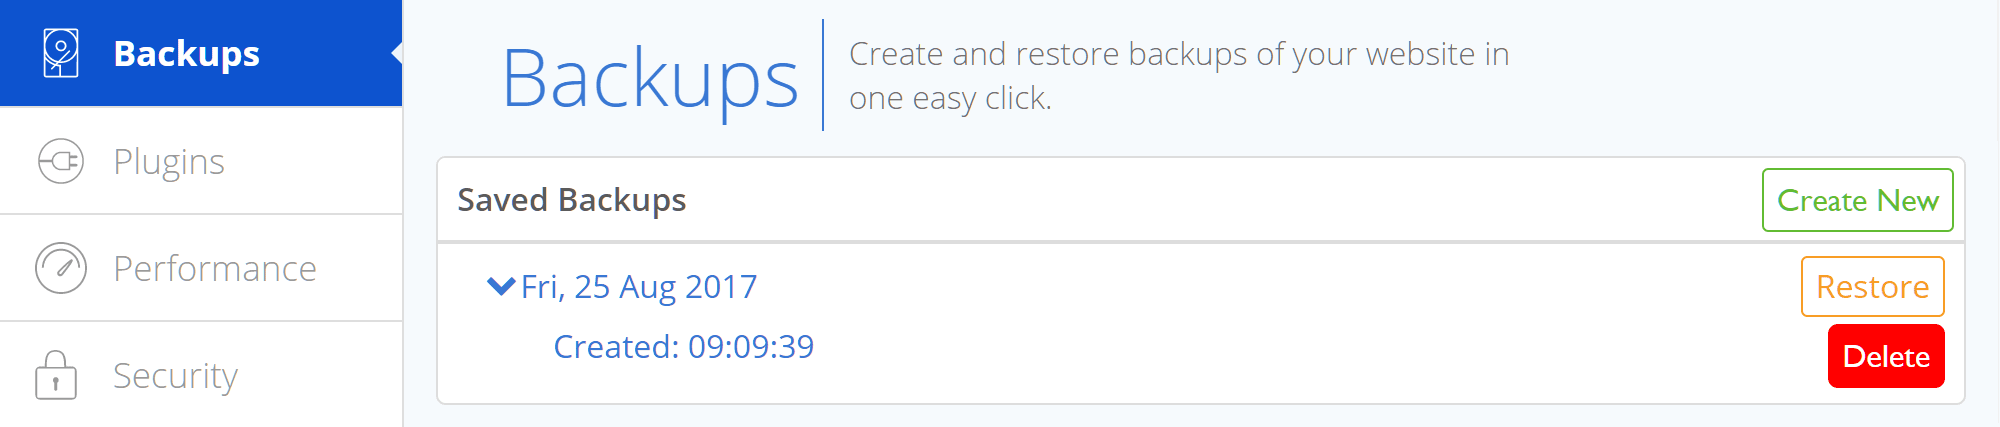 Bluehost WordPress Backup Management